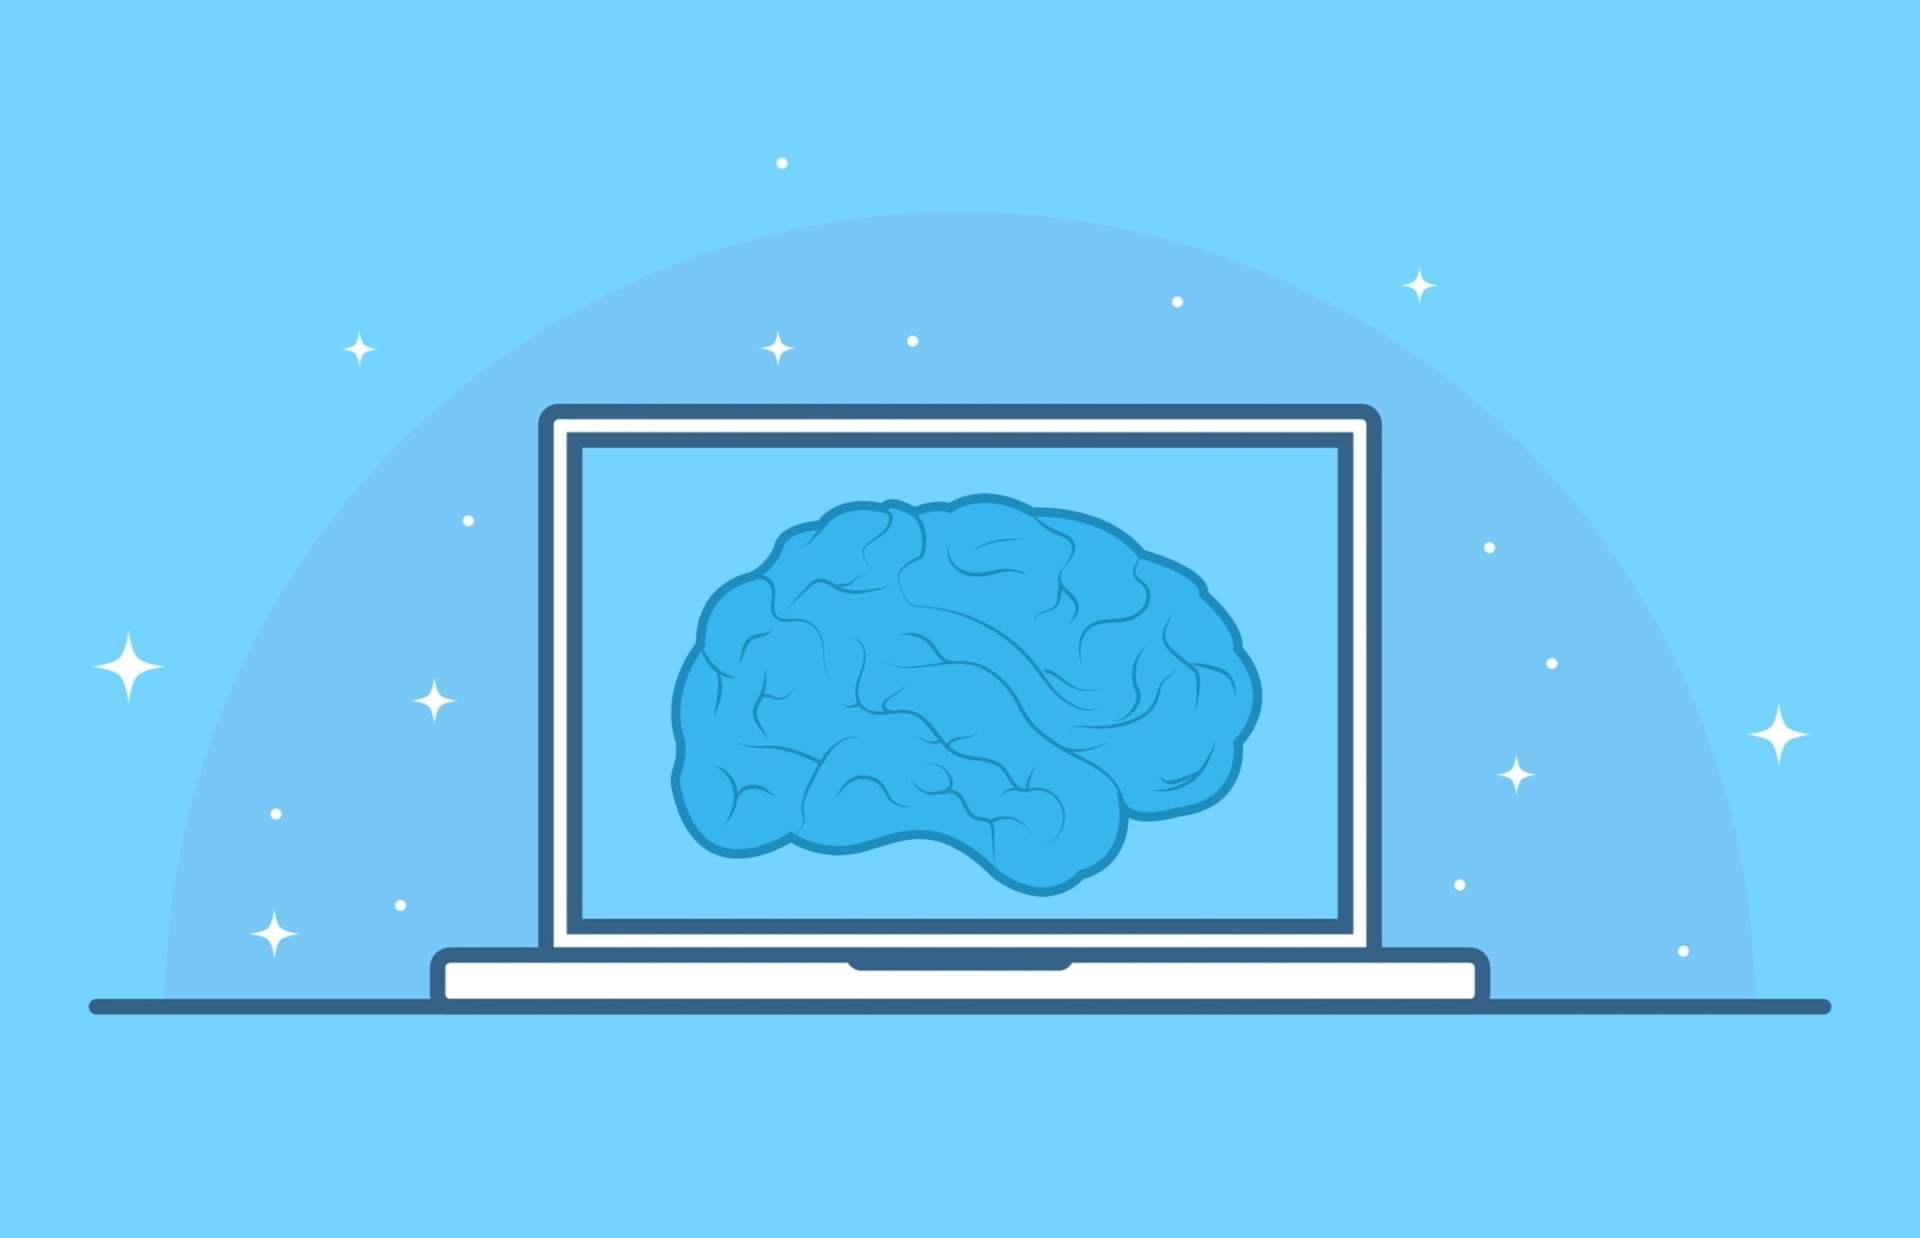 sztuczna inteligencja, AI, SI